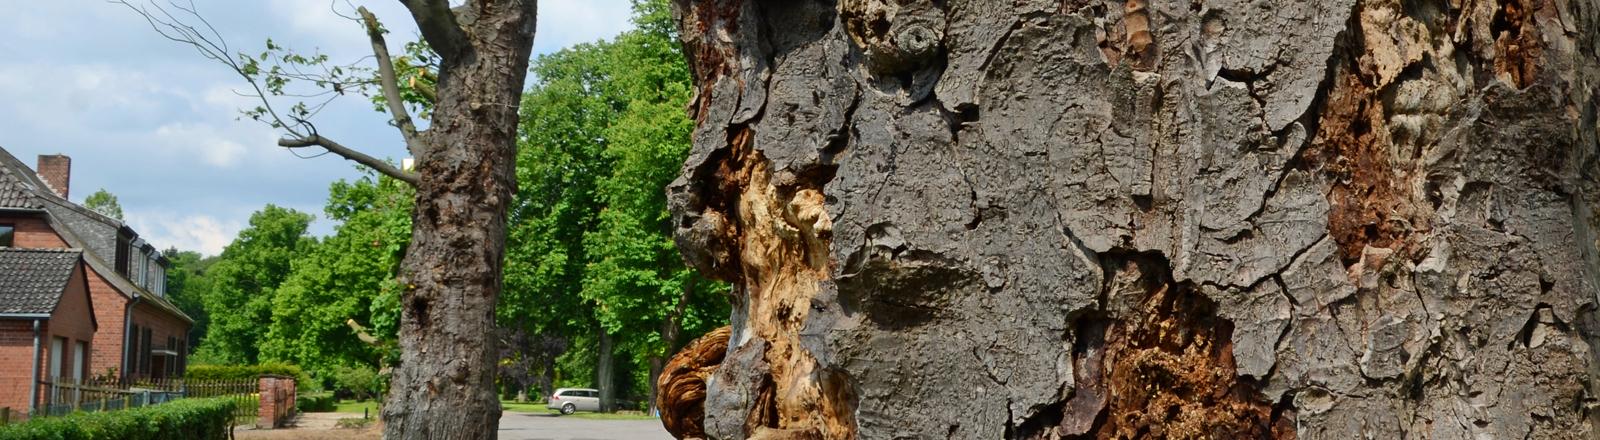 dpa: Kranker Kastanienbaum am Straßenrand.